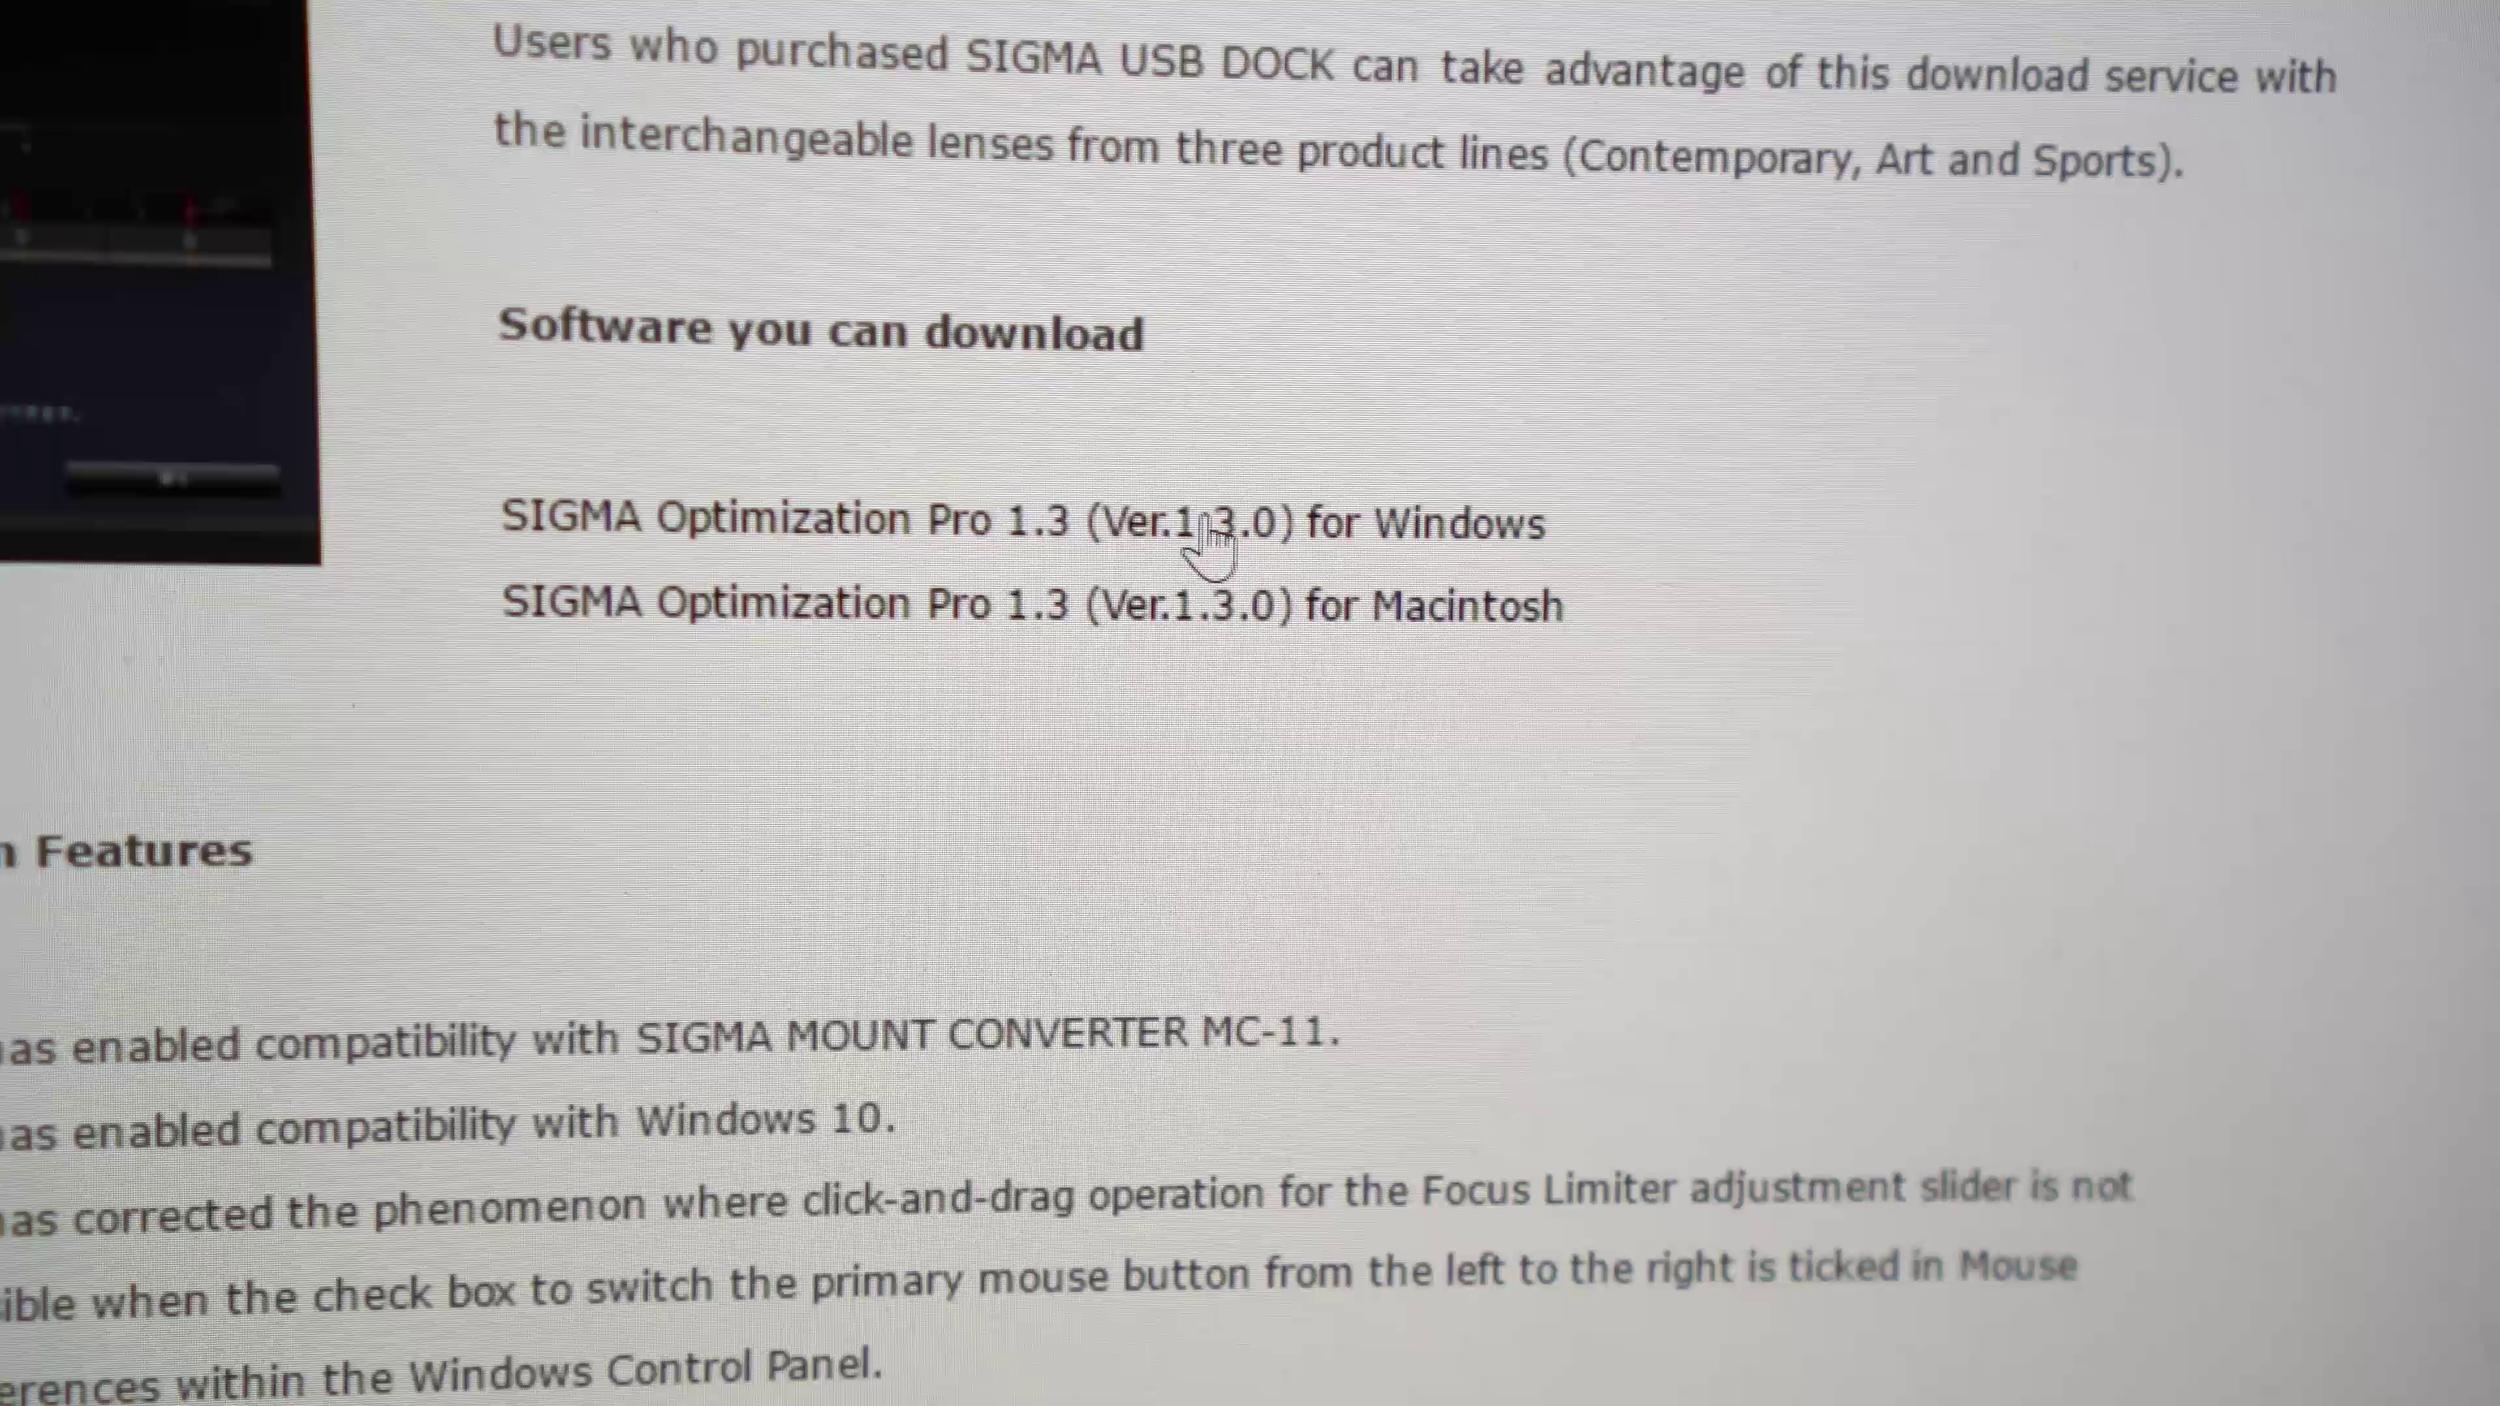 http://www.sigma-global.com/download/en/